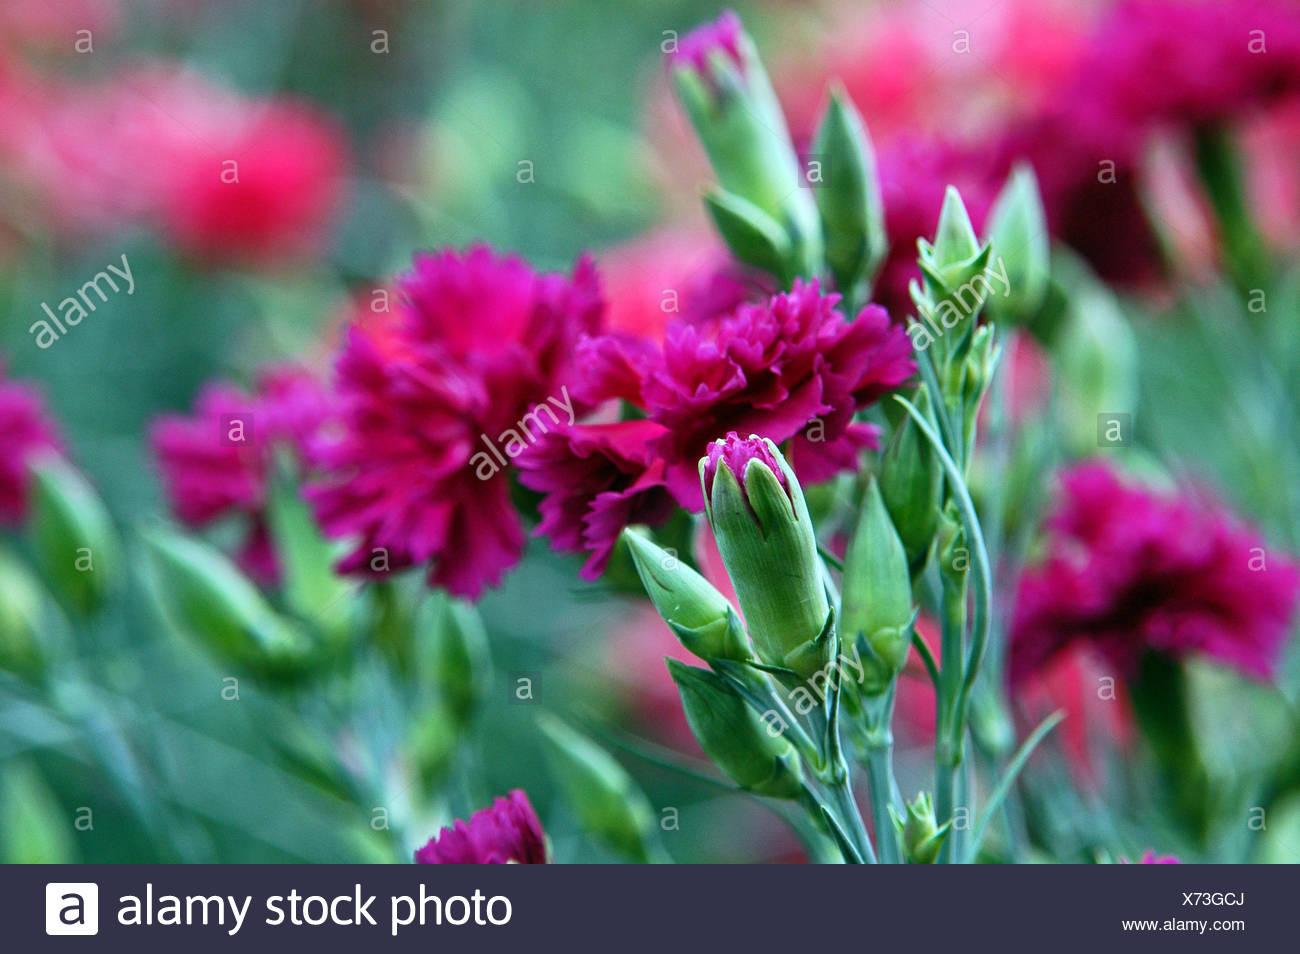 carnations - Stock Image